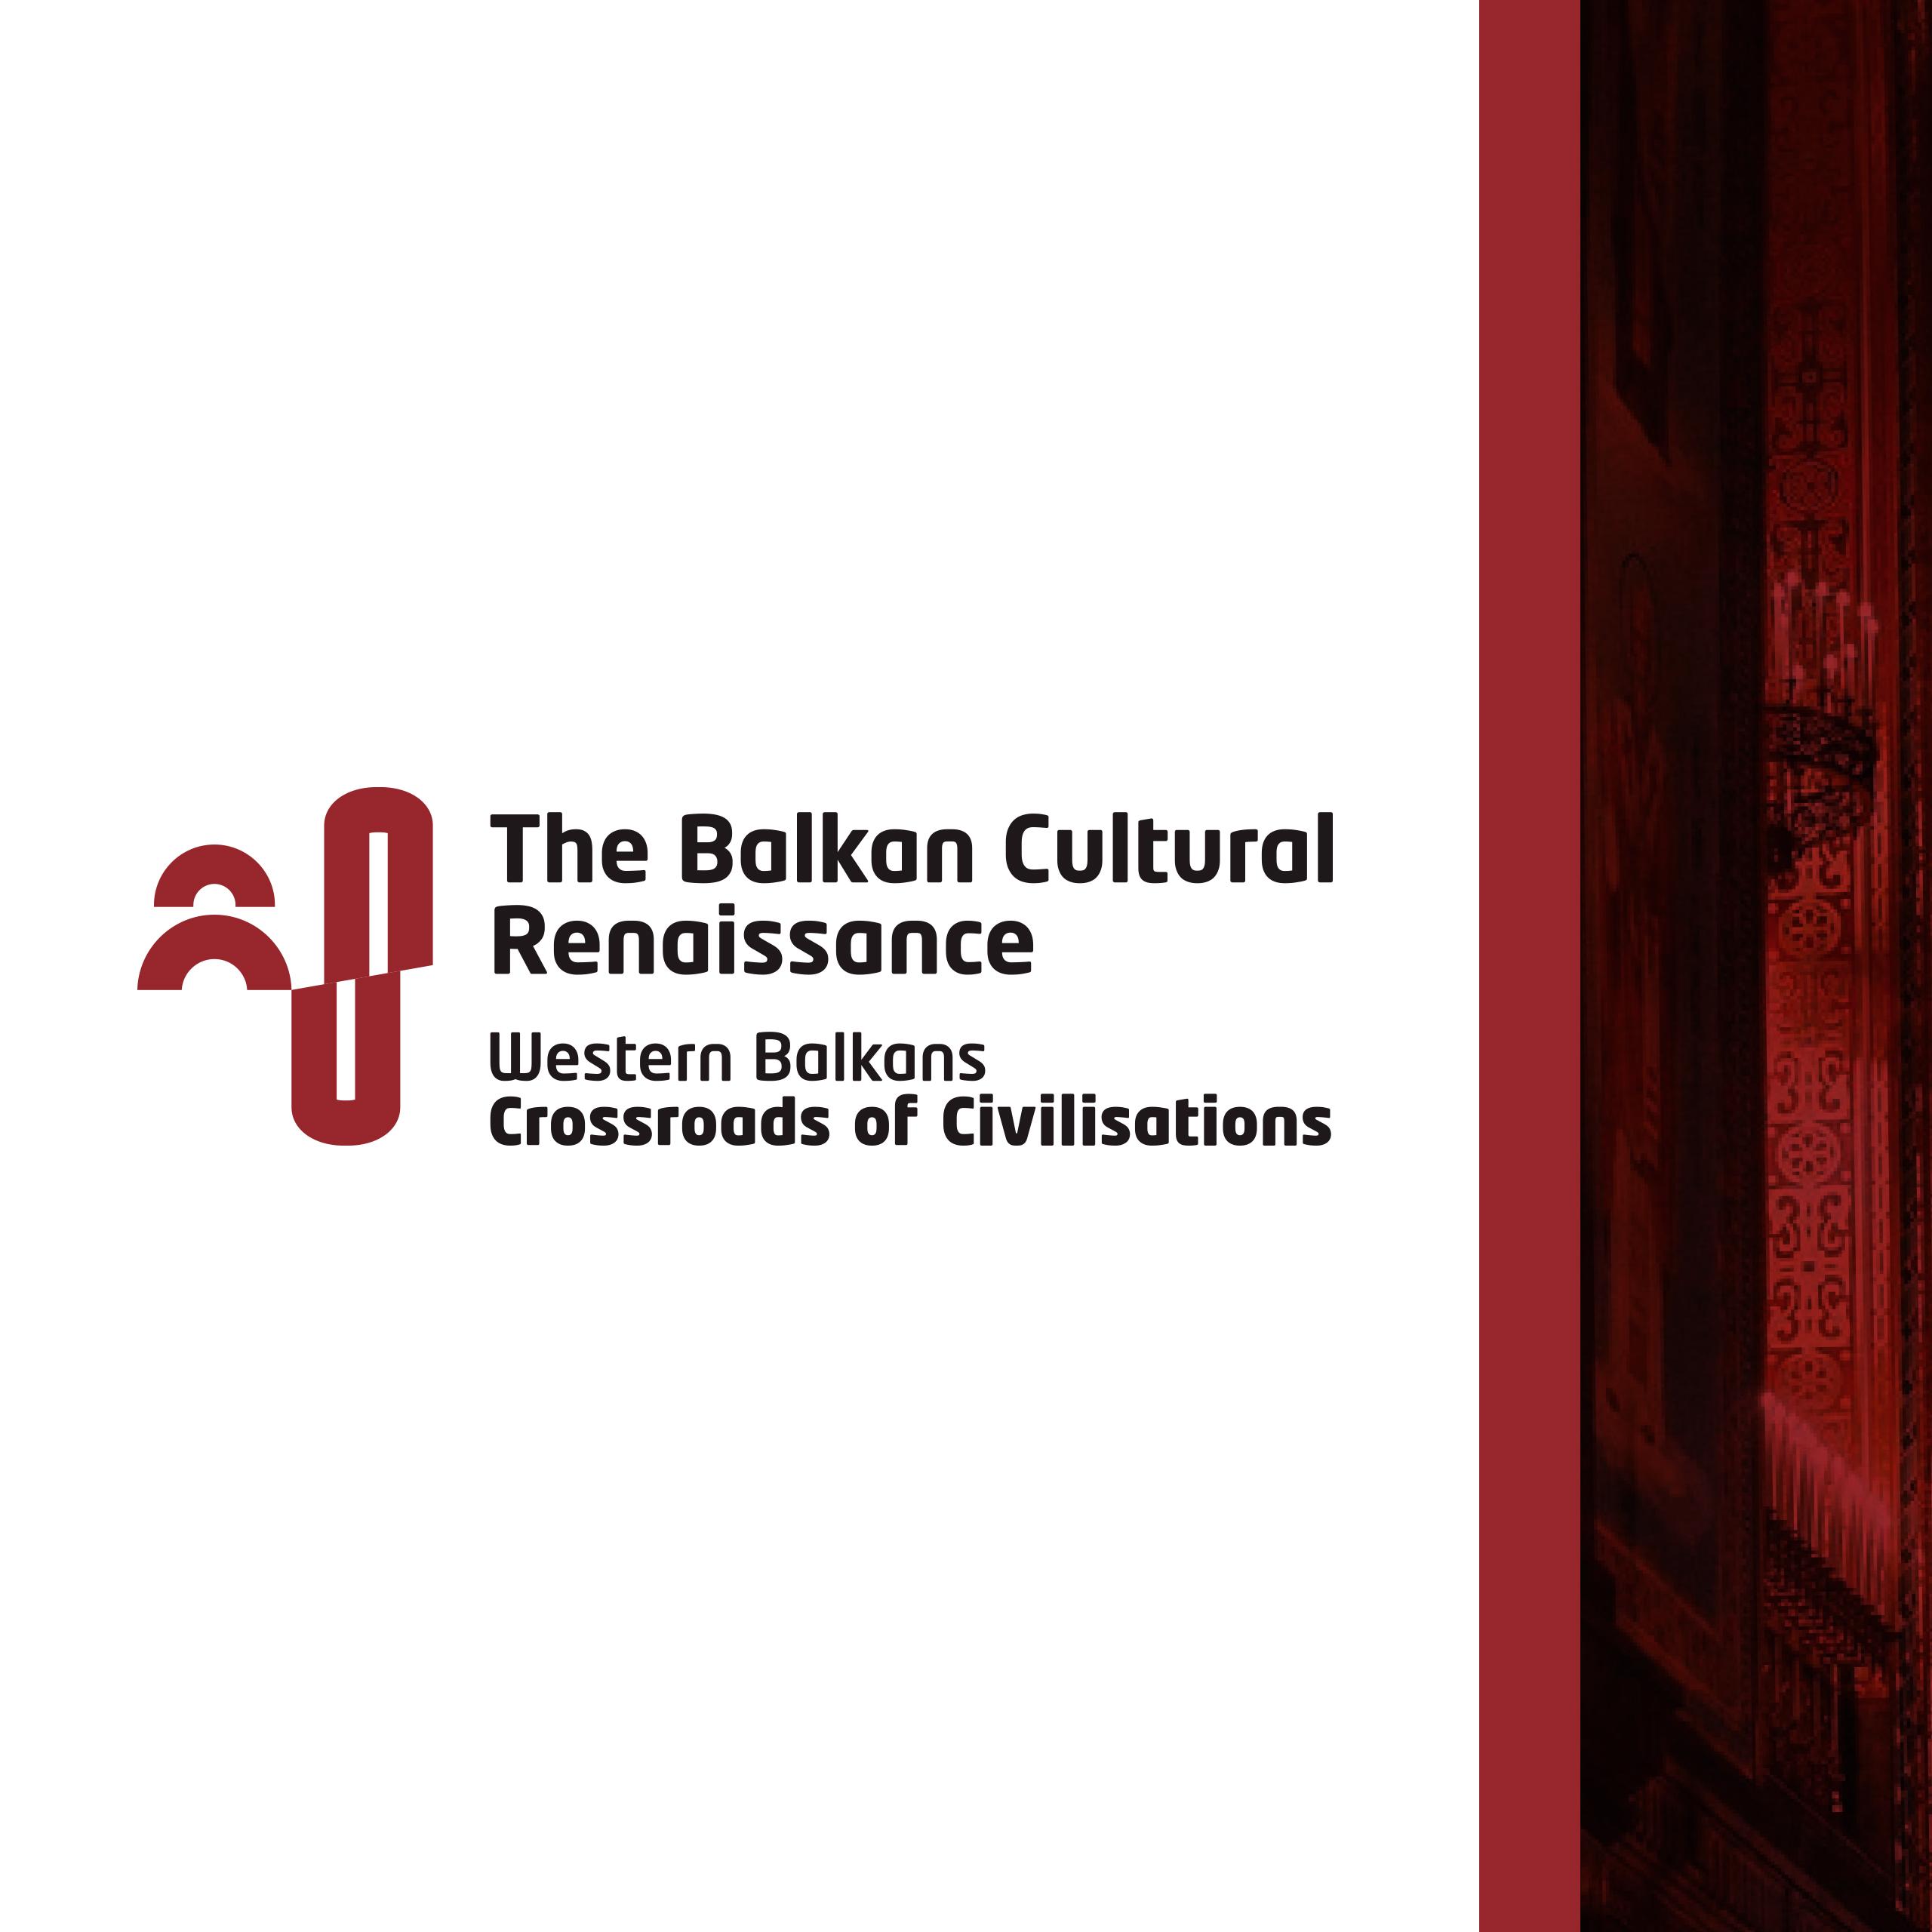 Western Balkans Crossroads of Civilisations, Project Img 15 - Vatra Agency / Founder & CEO Gerton Bejo